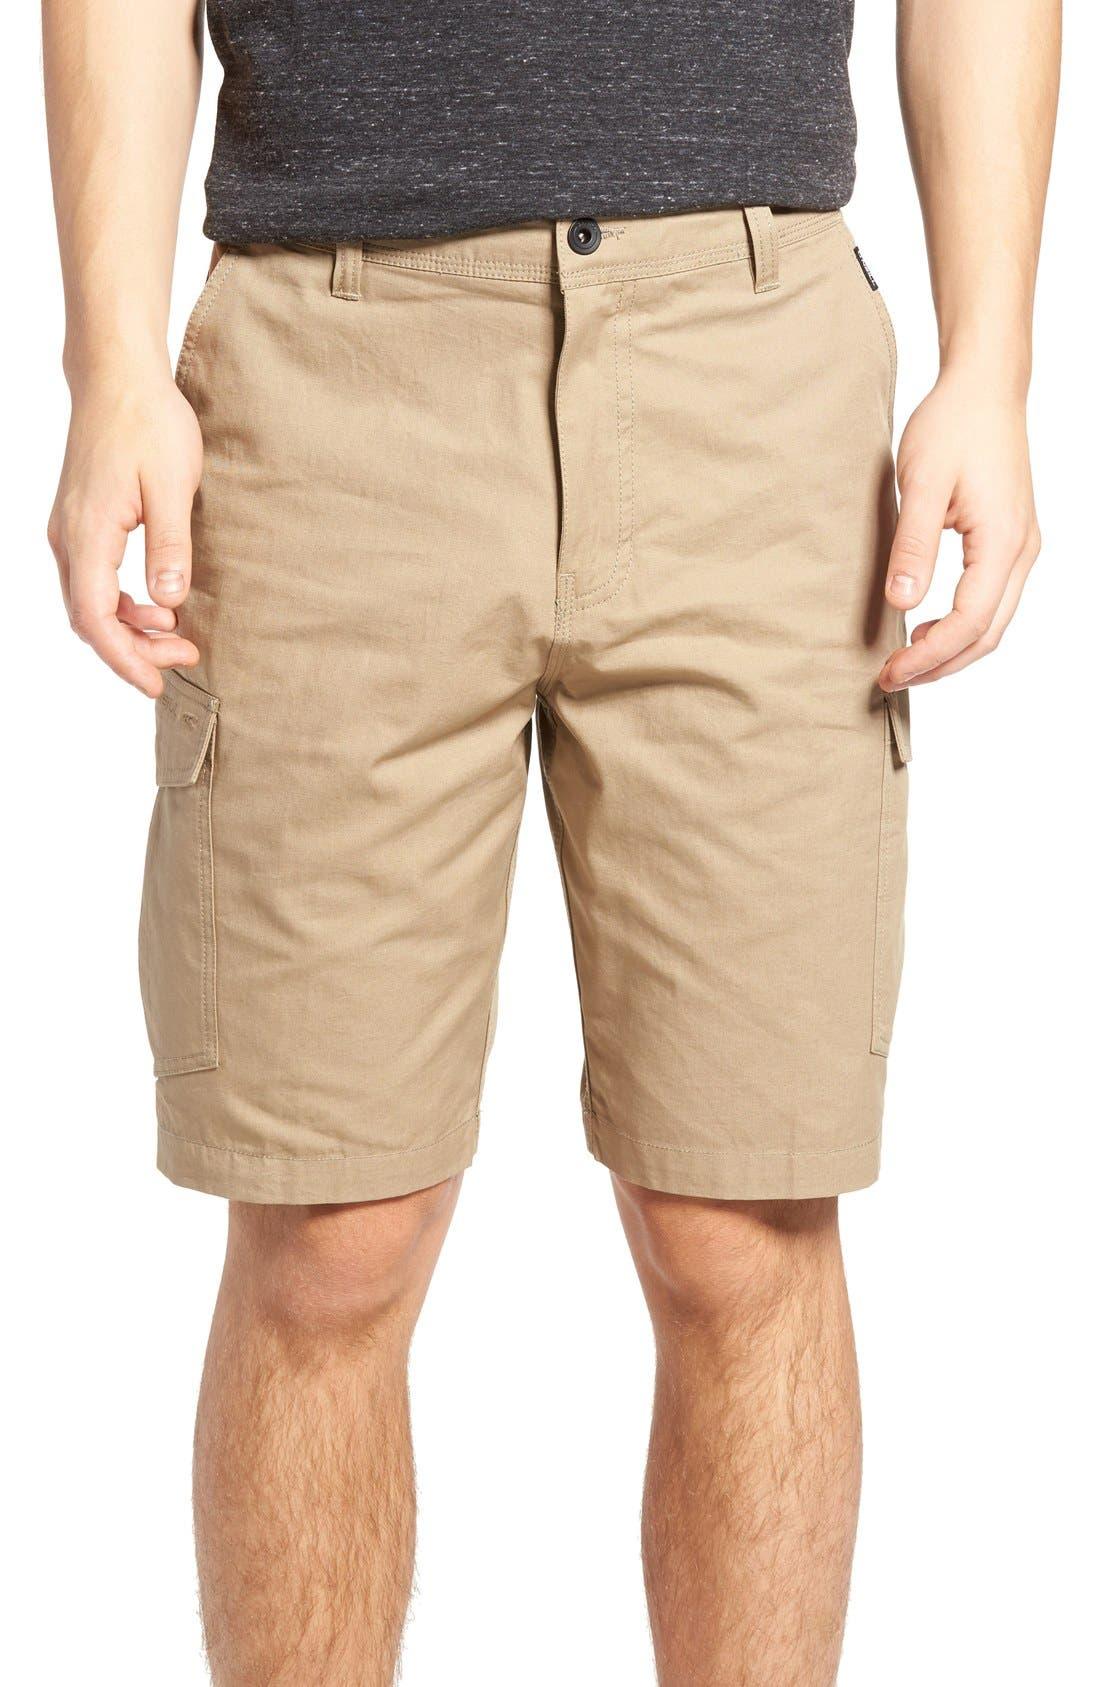 O'NEILL El Toro Cargo Shorts